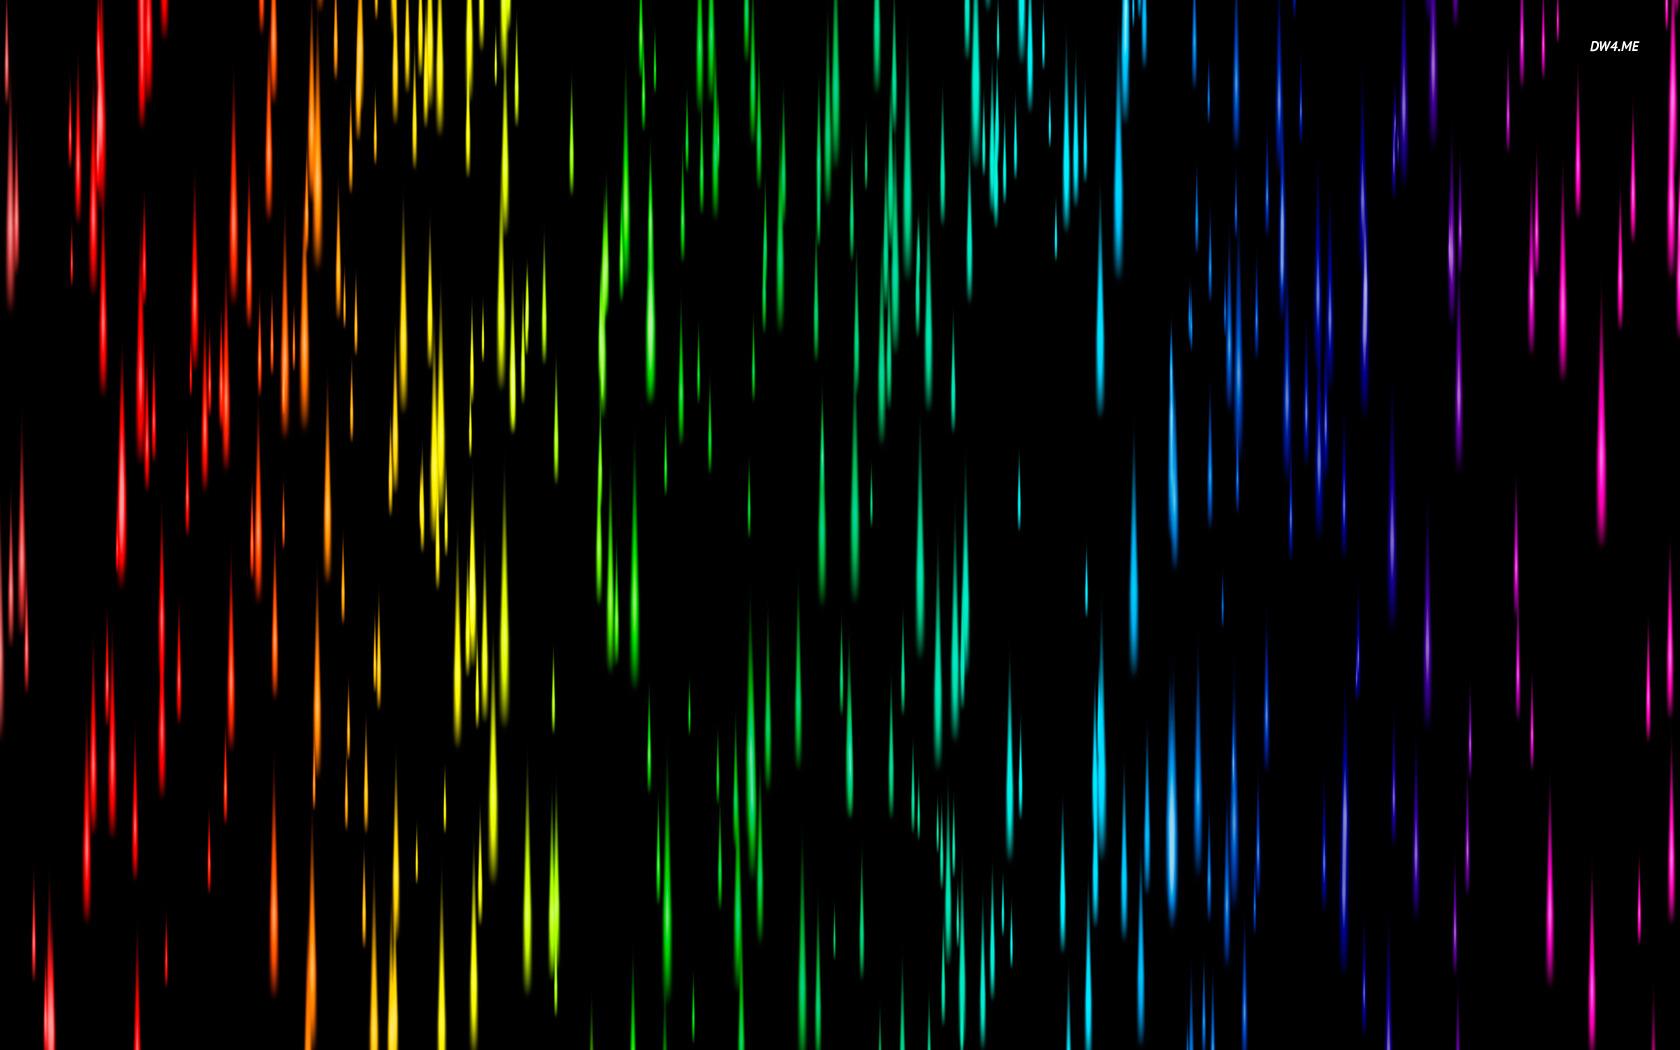 Colorful rain wallpaper 1920x1080 Colorful rain wallpaper 1920x1200 1680x1050